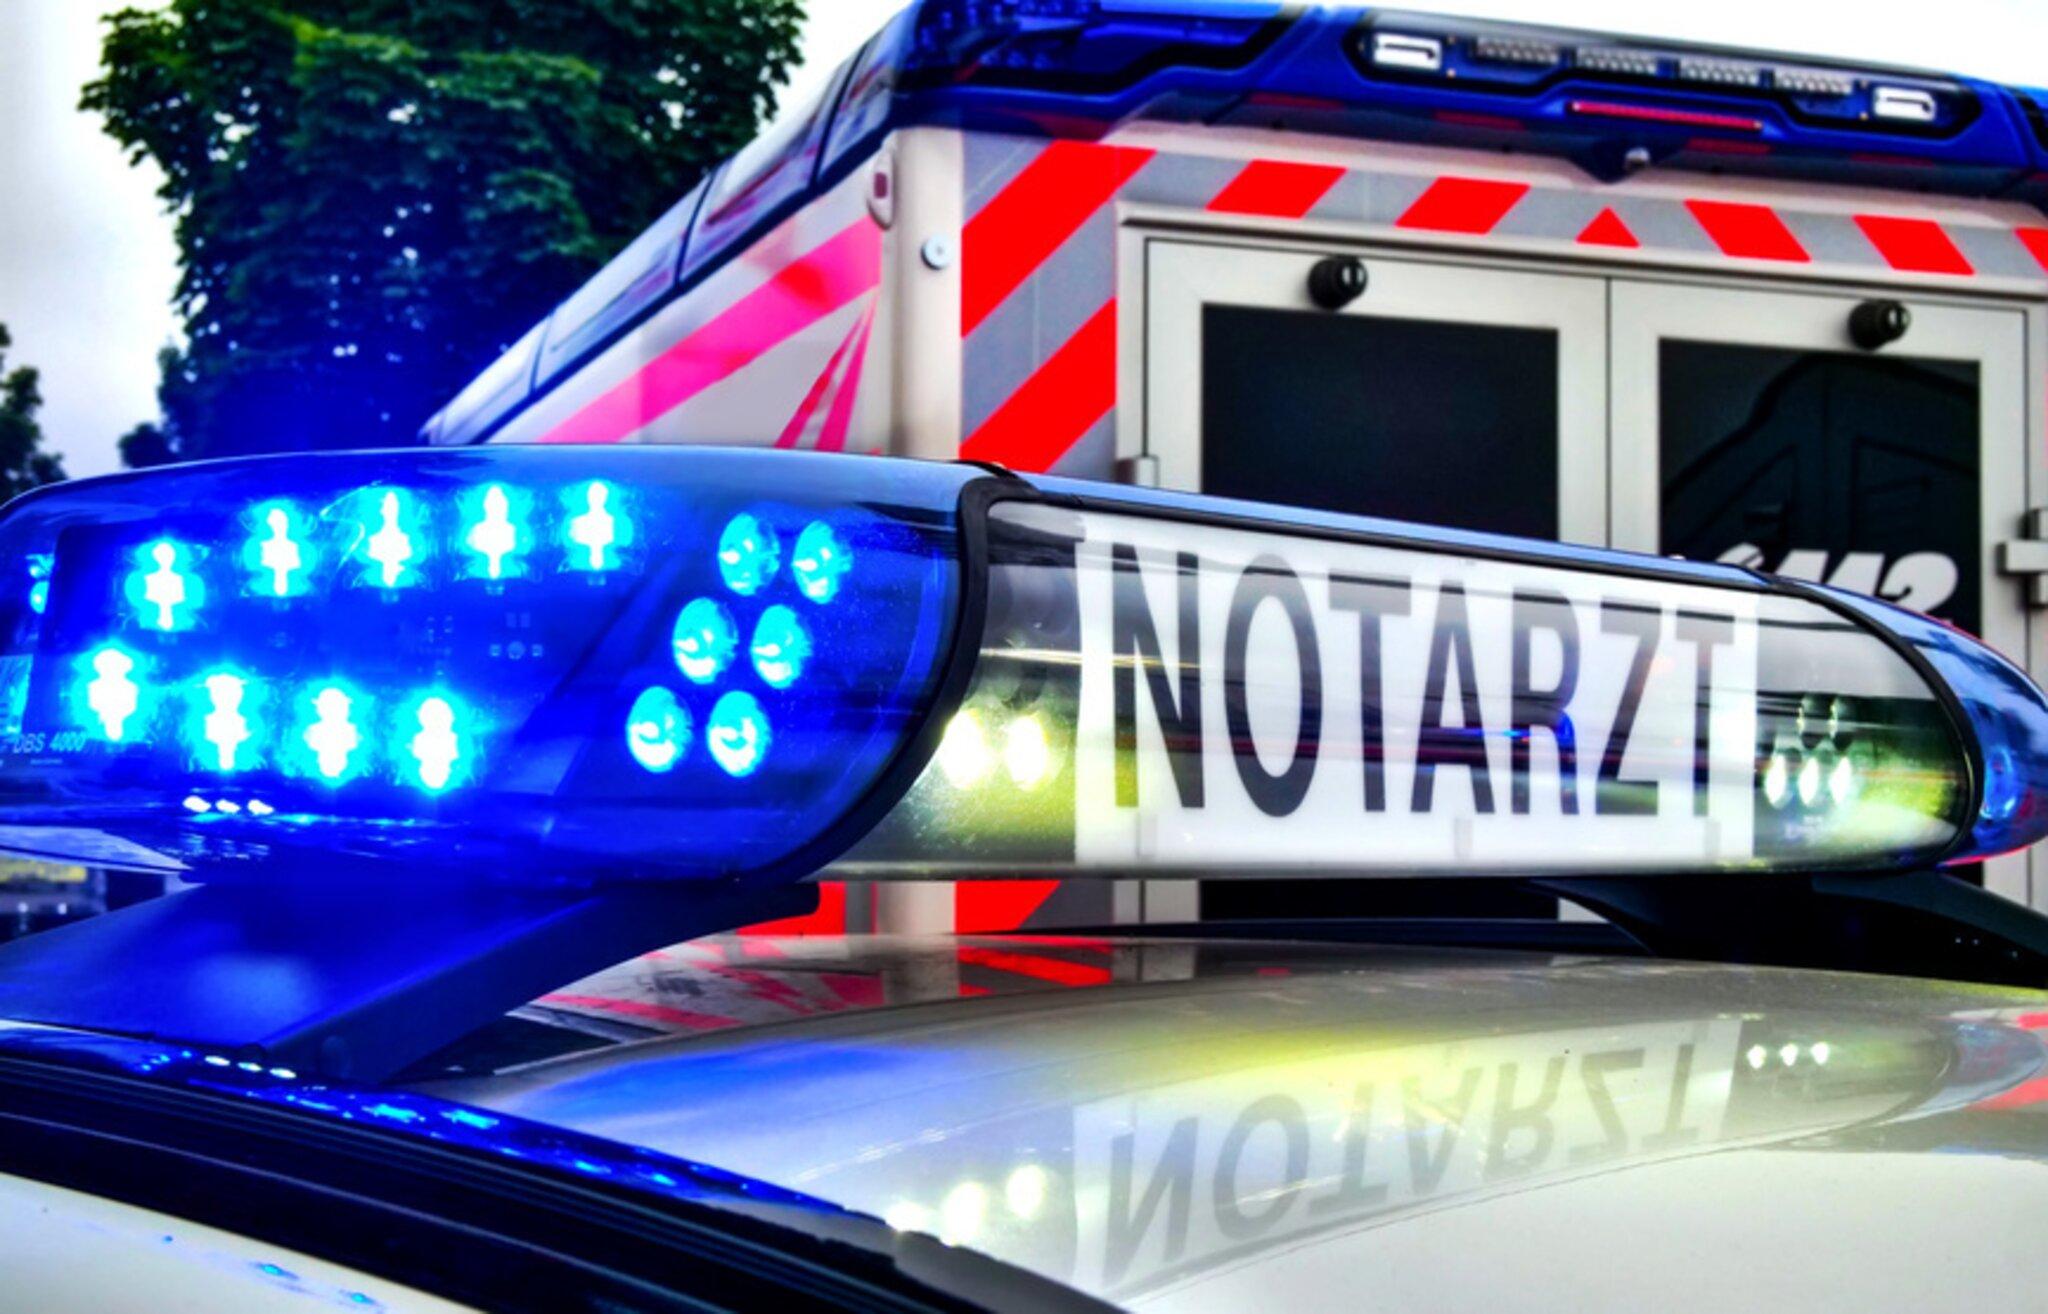 Raum-Miltenberg-Unfallflucht-Fahren-ohne-Fahrerlaubnis-Verkehrsunfall-mit-Personenschaden-Sachbesch-digung